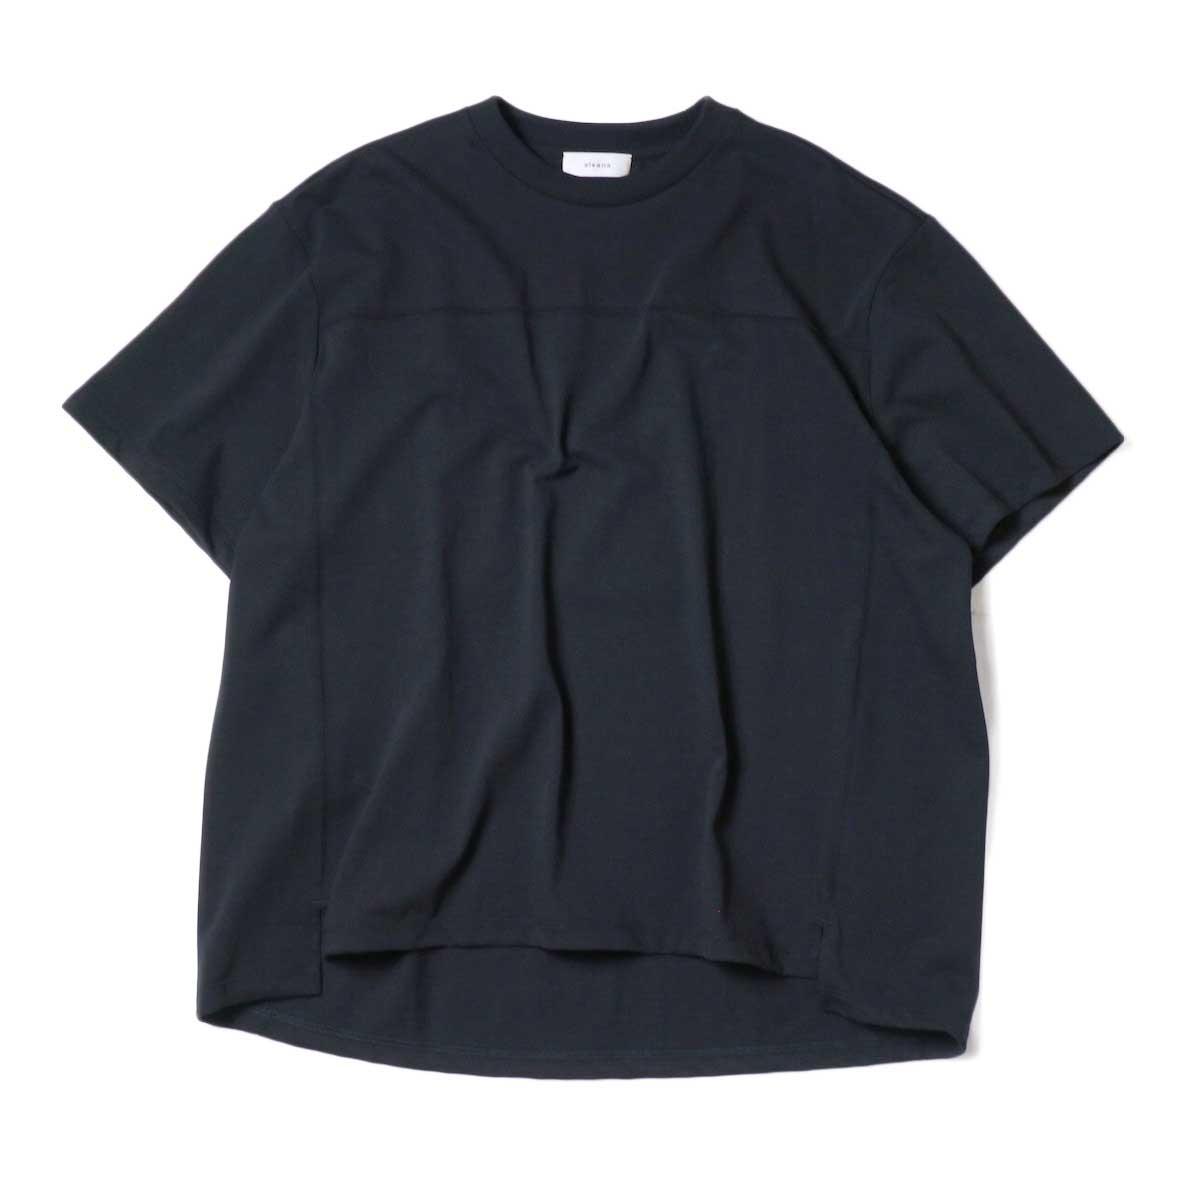 alvana / Protect Football S/S Tee (Black) 正面